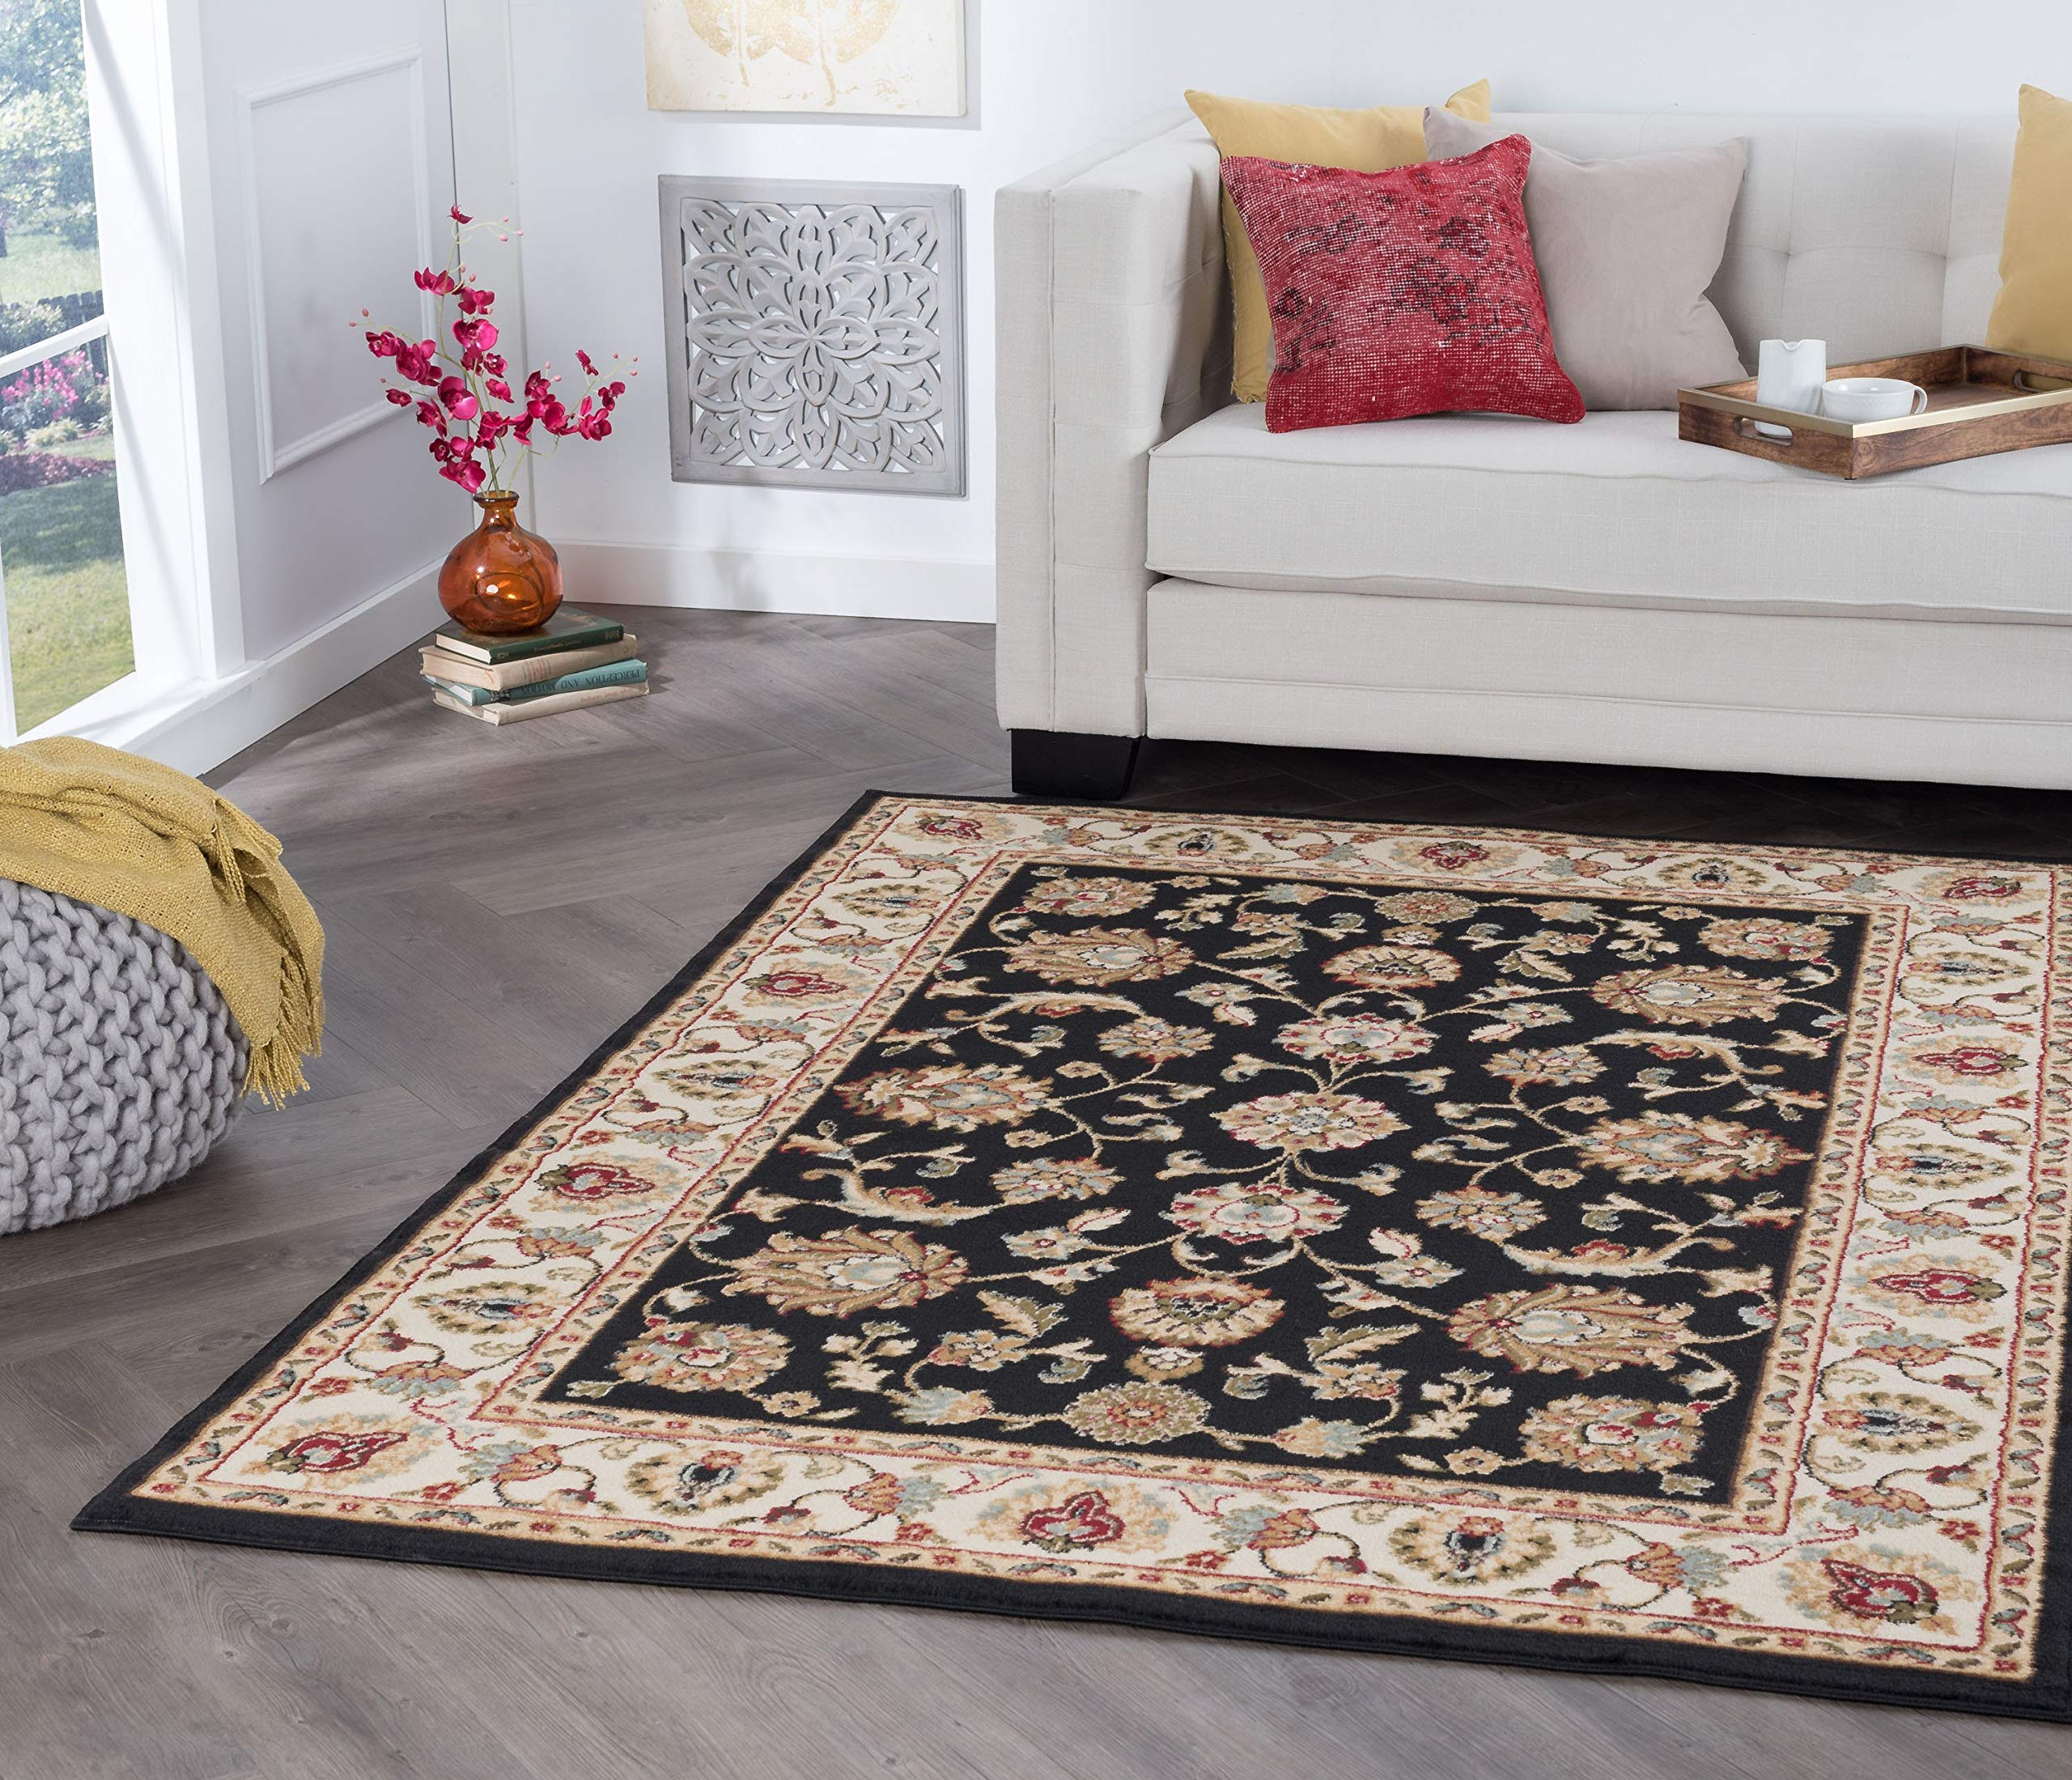 Tayse Charleston Black 4x6 Rectangle Area Rug for Dorm, Kids, Baby, or Nursery Room - Traditional, Oriental